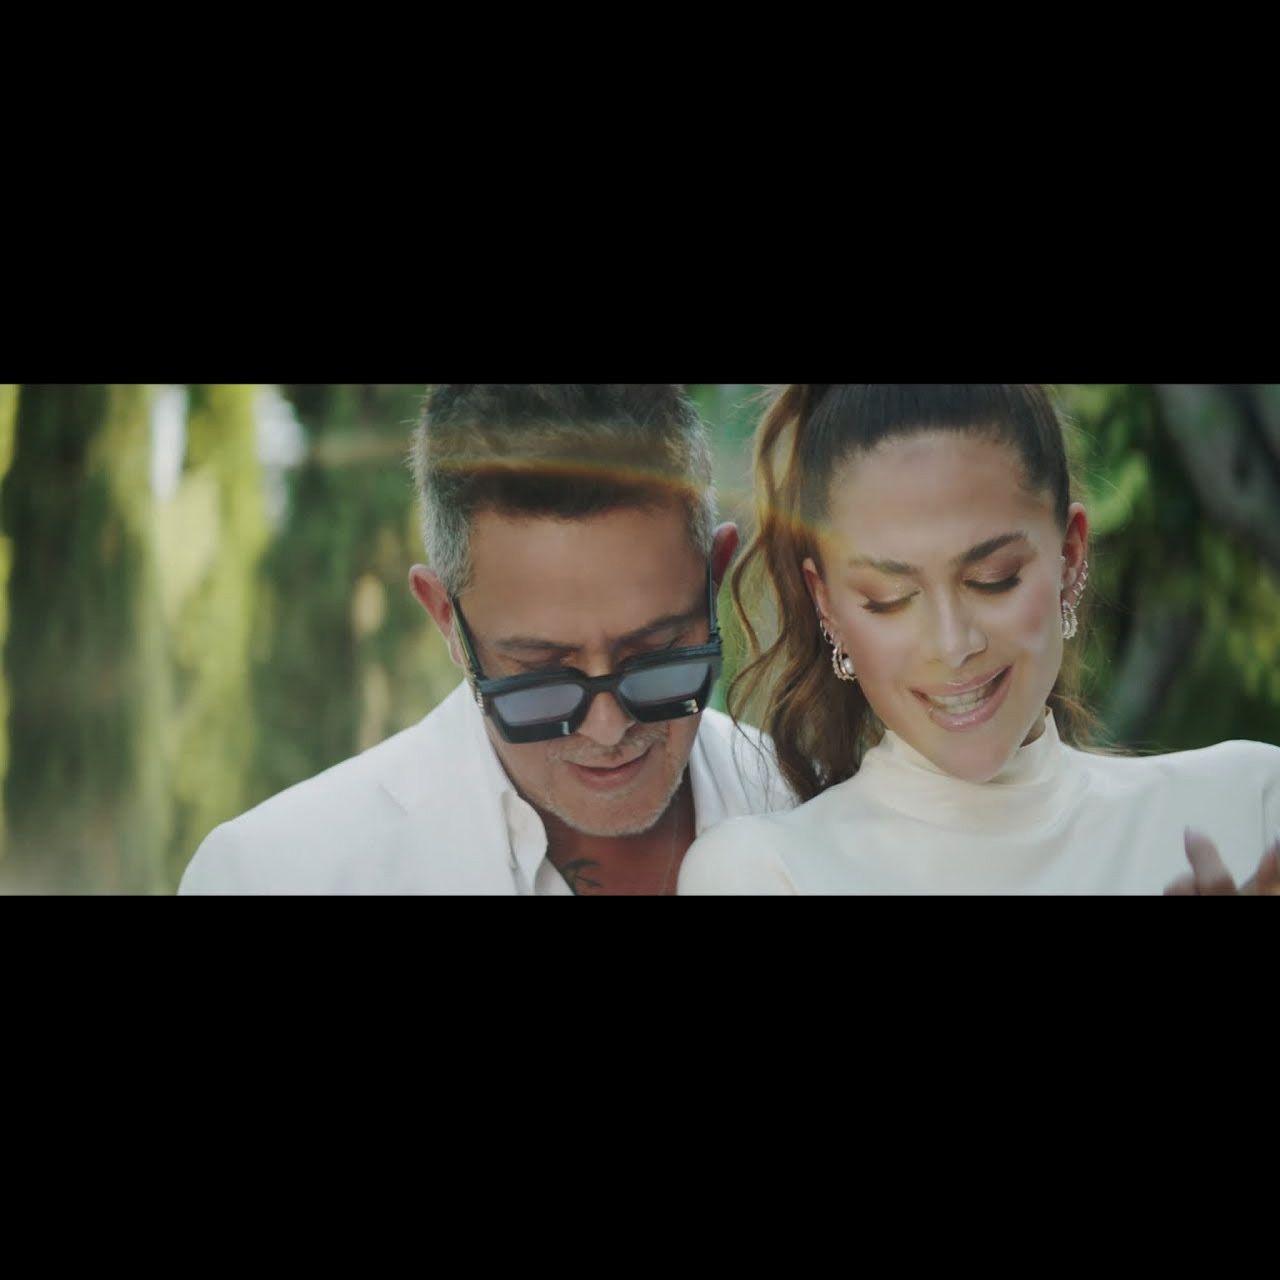 Greeicy - Lejos conmigo (ft. Alejandro Sanz) (Thumbnail)